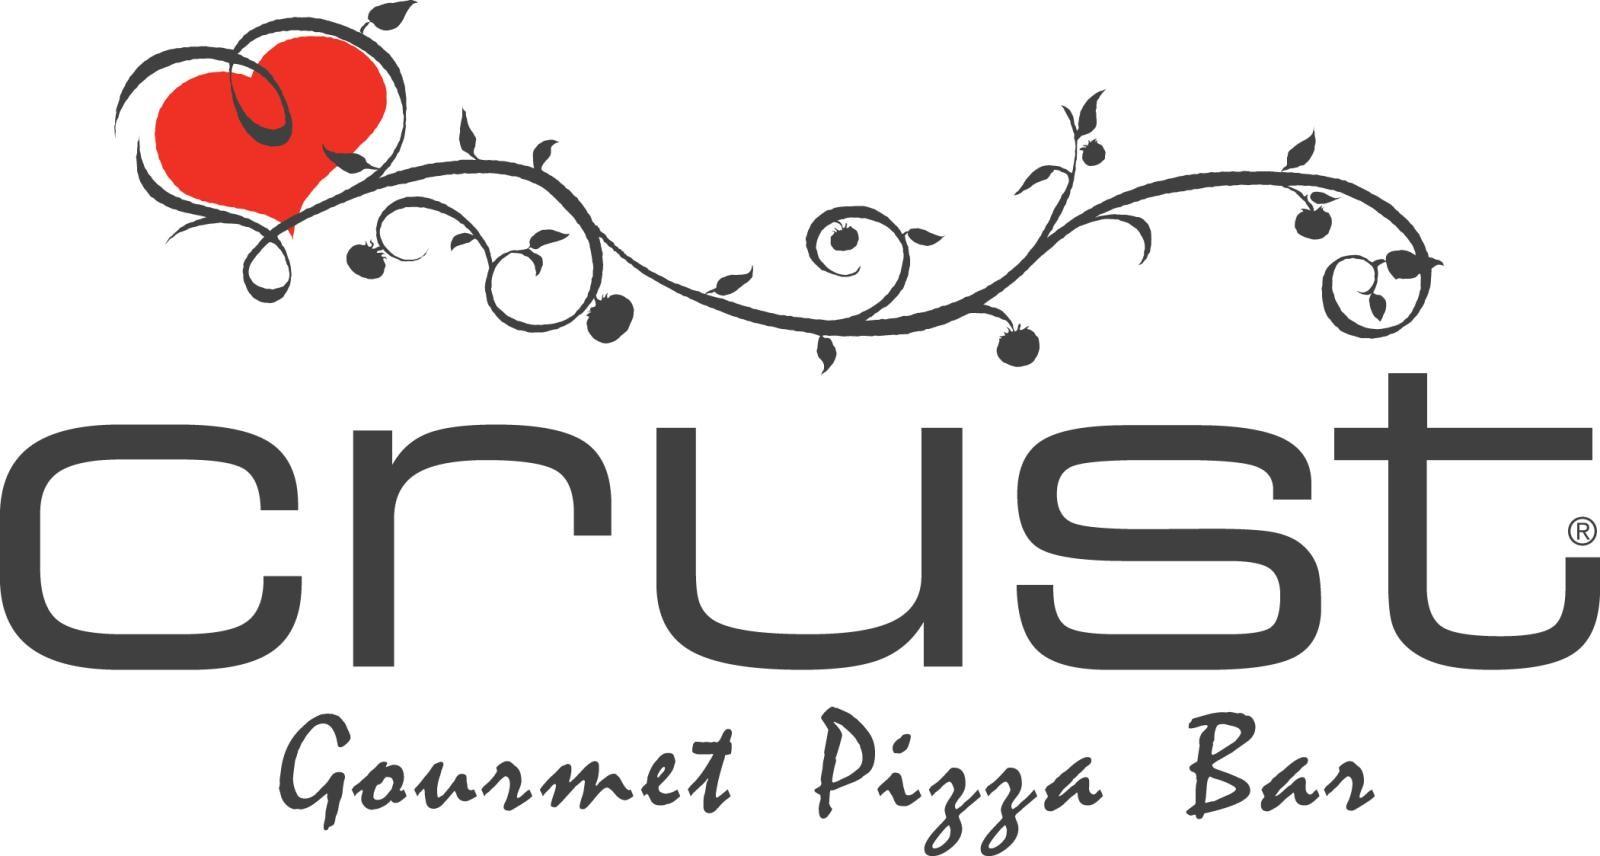 PROFITABLE CRUST GOURMET PIZZA BAR FRANCHISES FOR SALE IN PRIME NEWCASTLE LOCATI